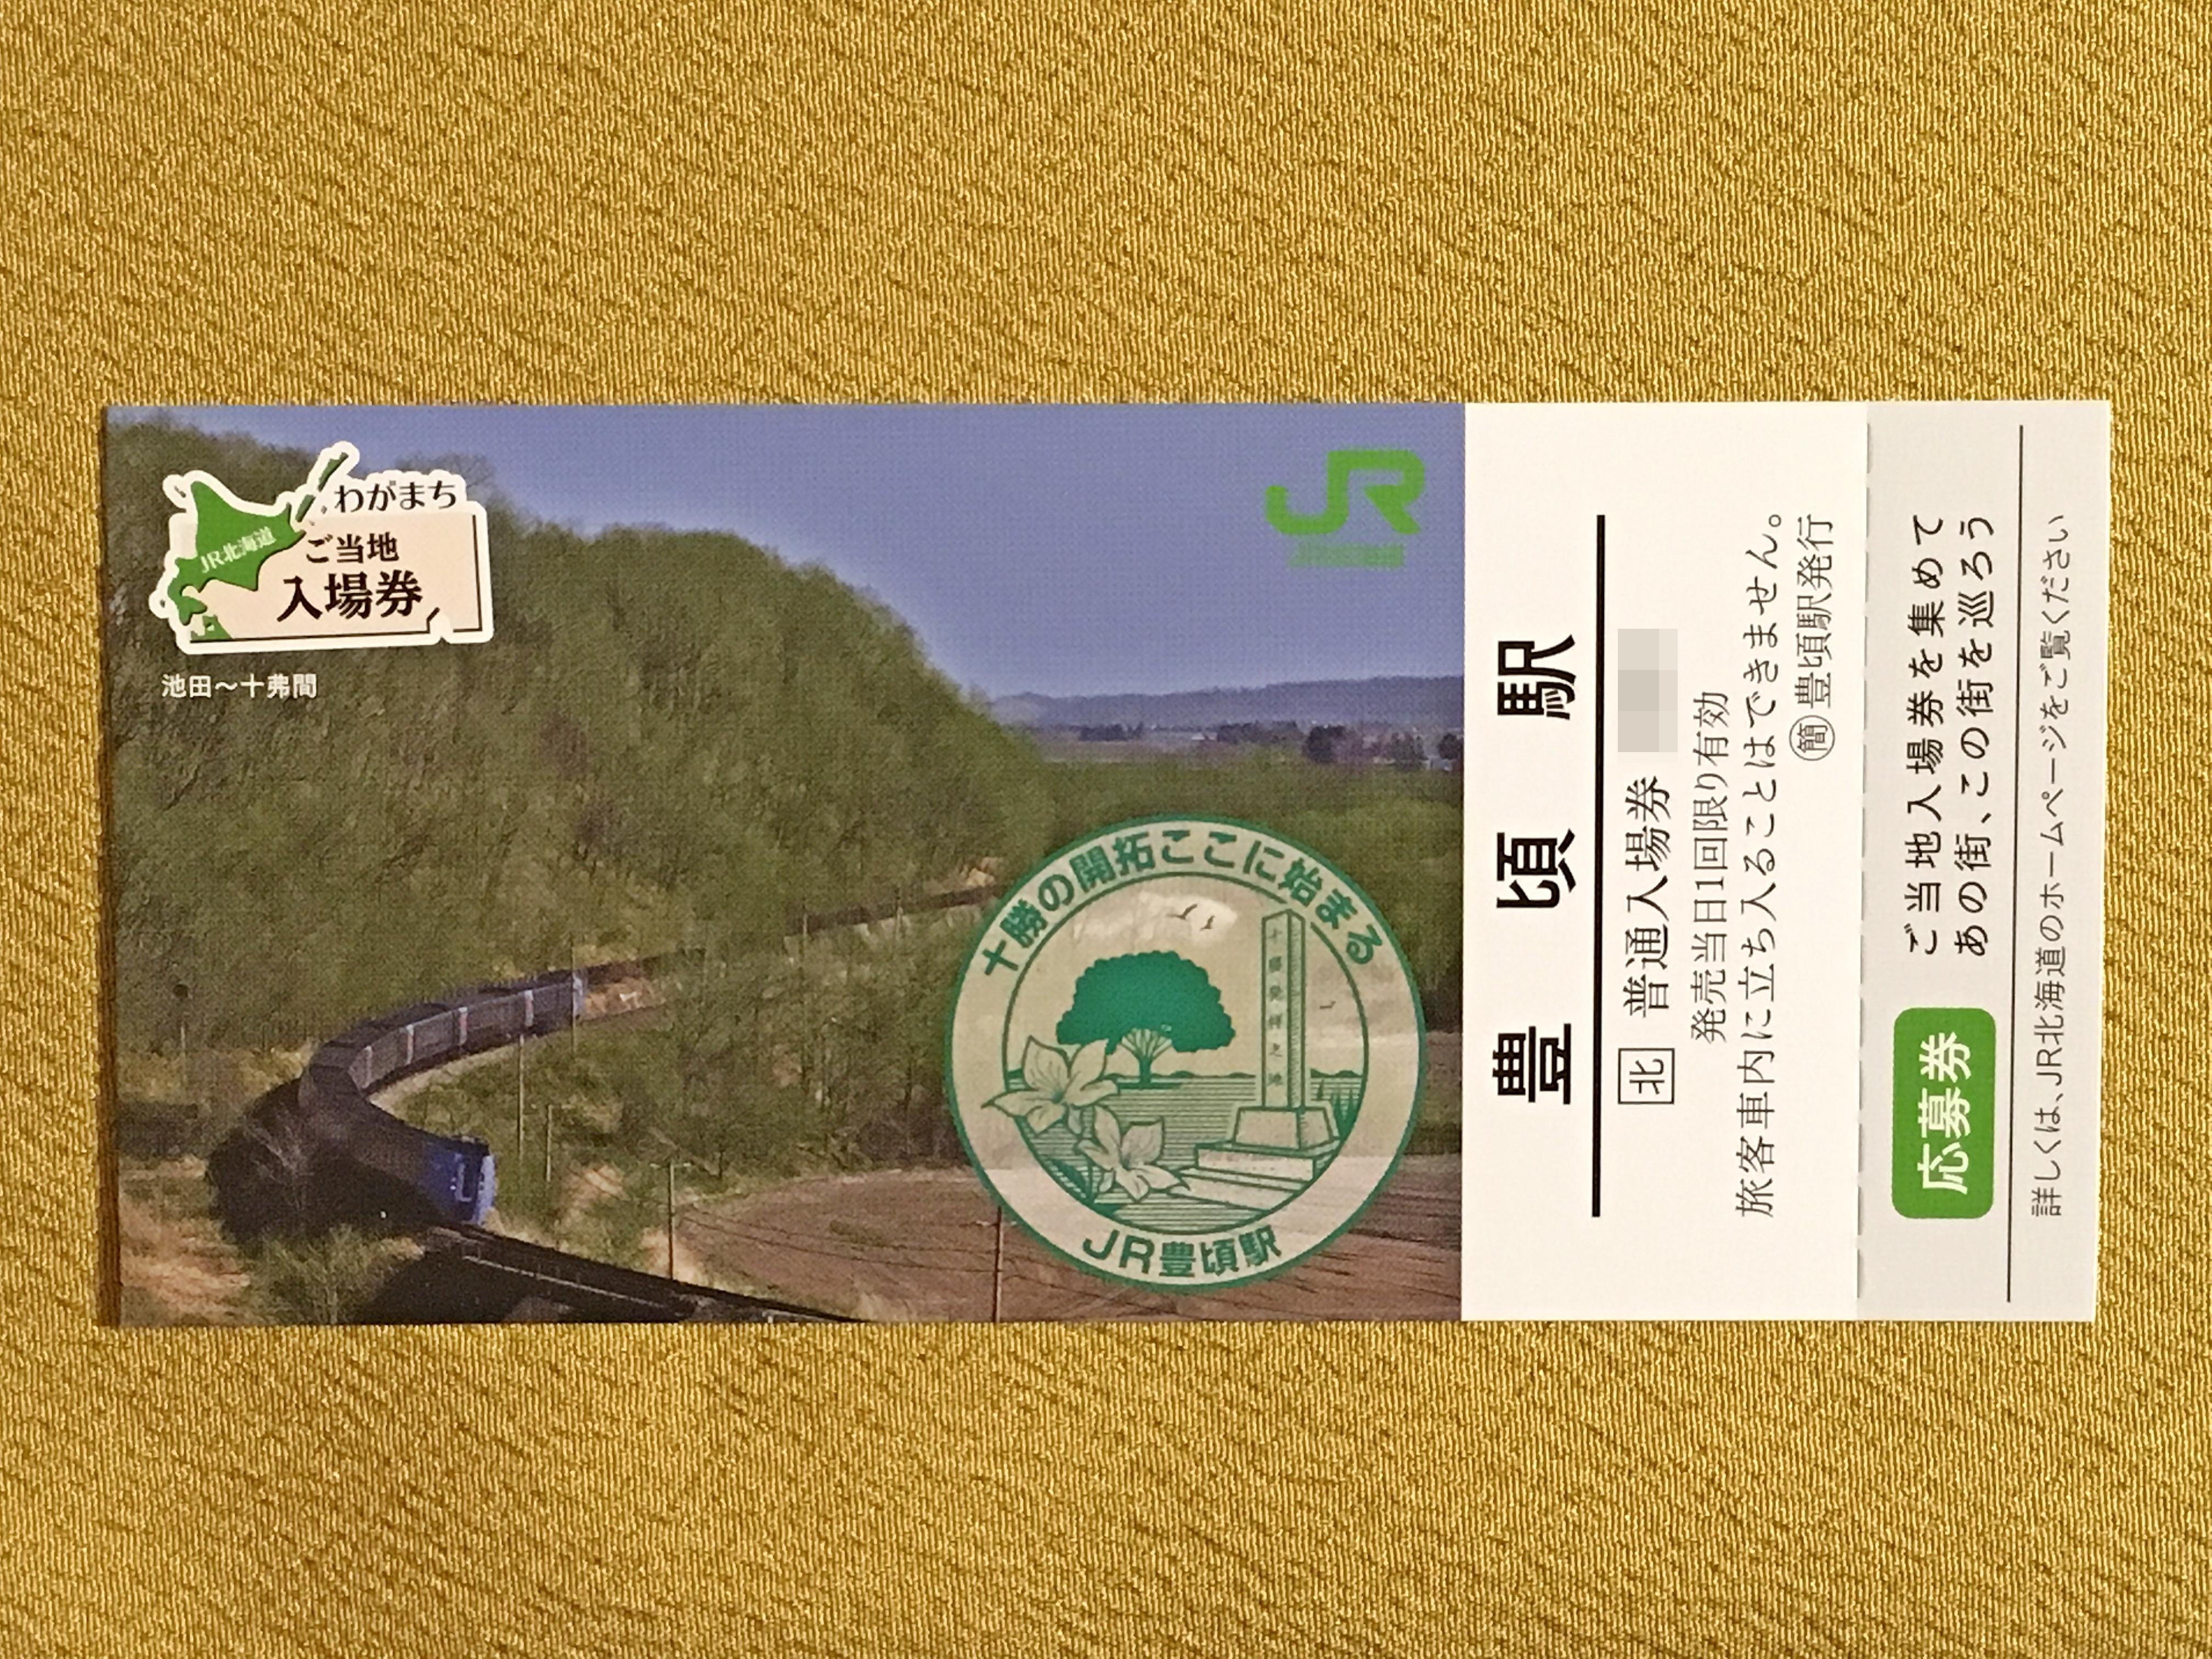 JR北海道ご当地入場券 豊頃駅表.JPG